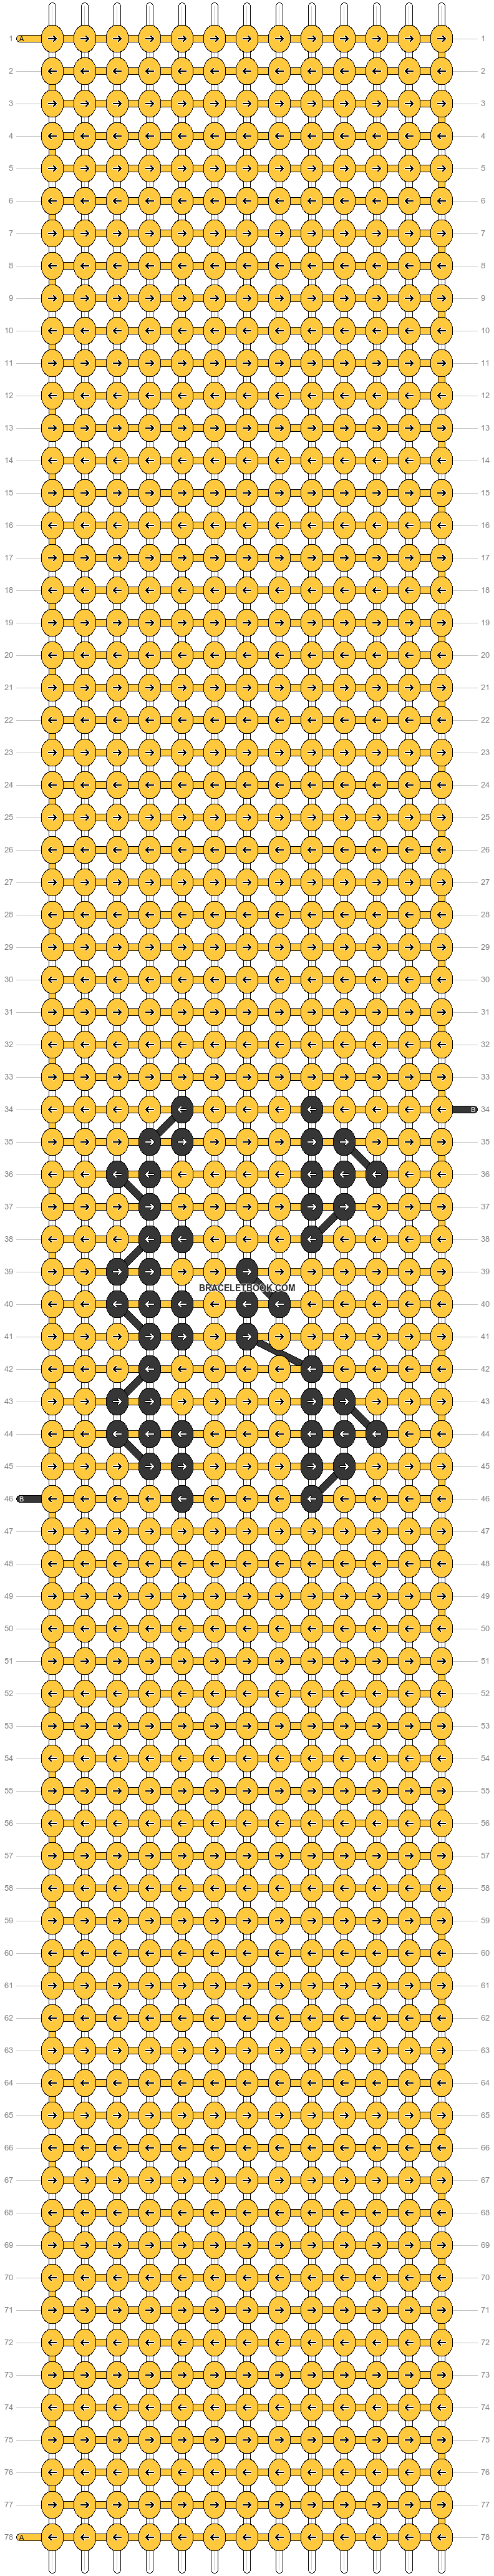 Alpha pattern #59110 pattern